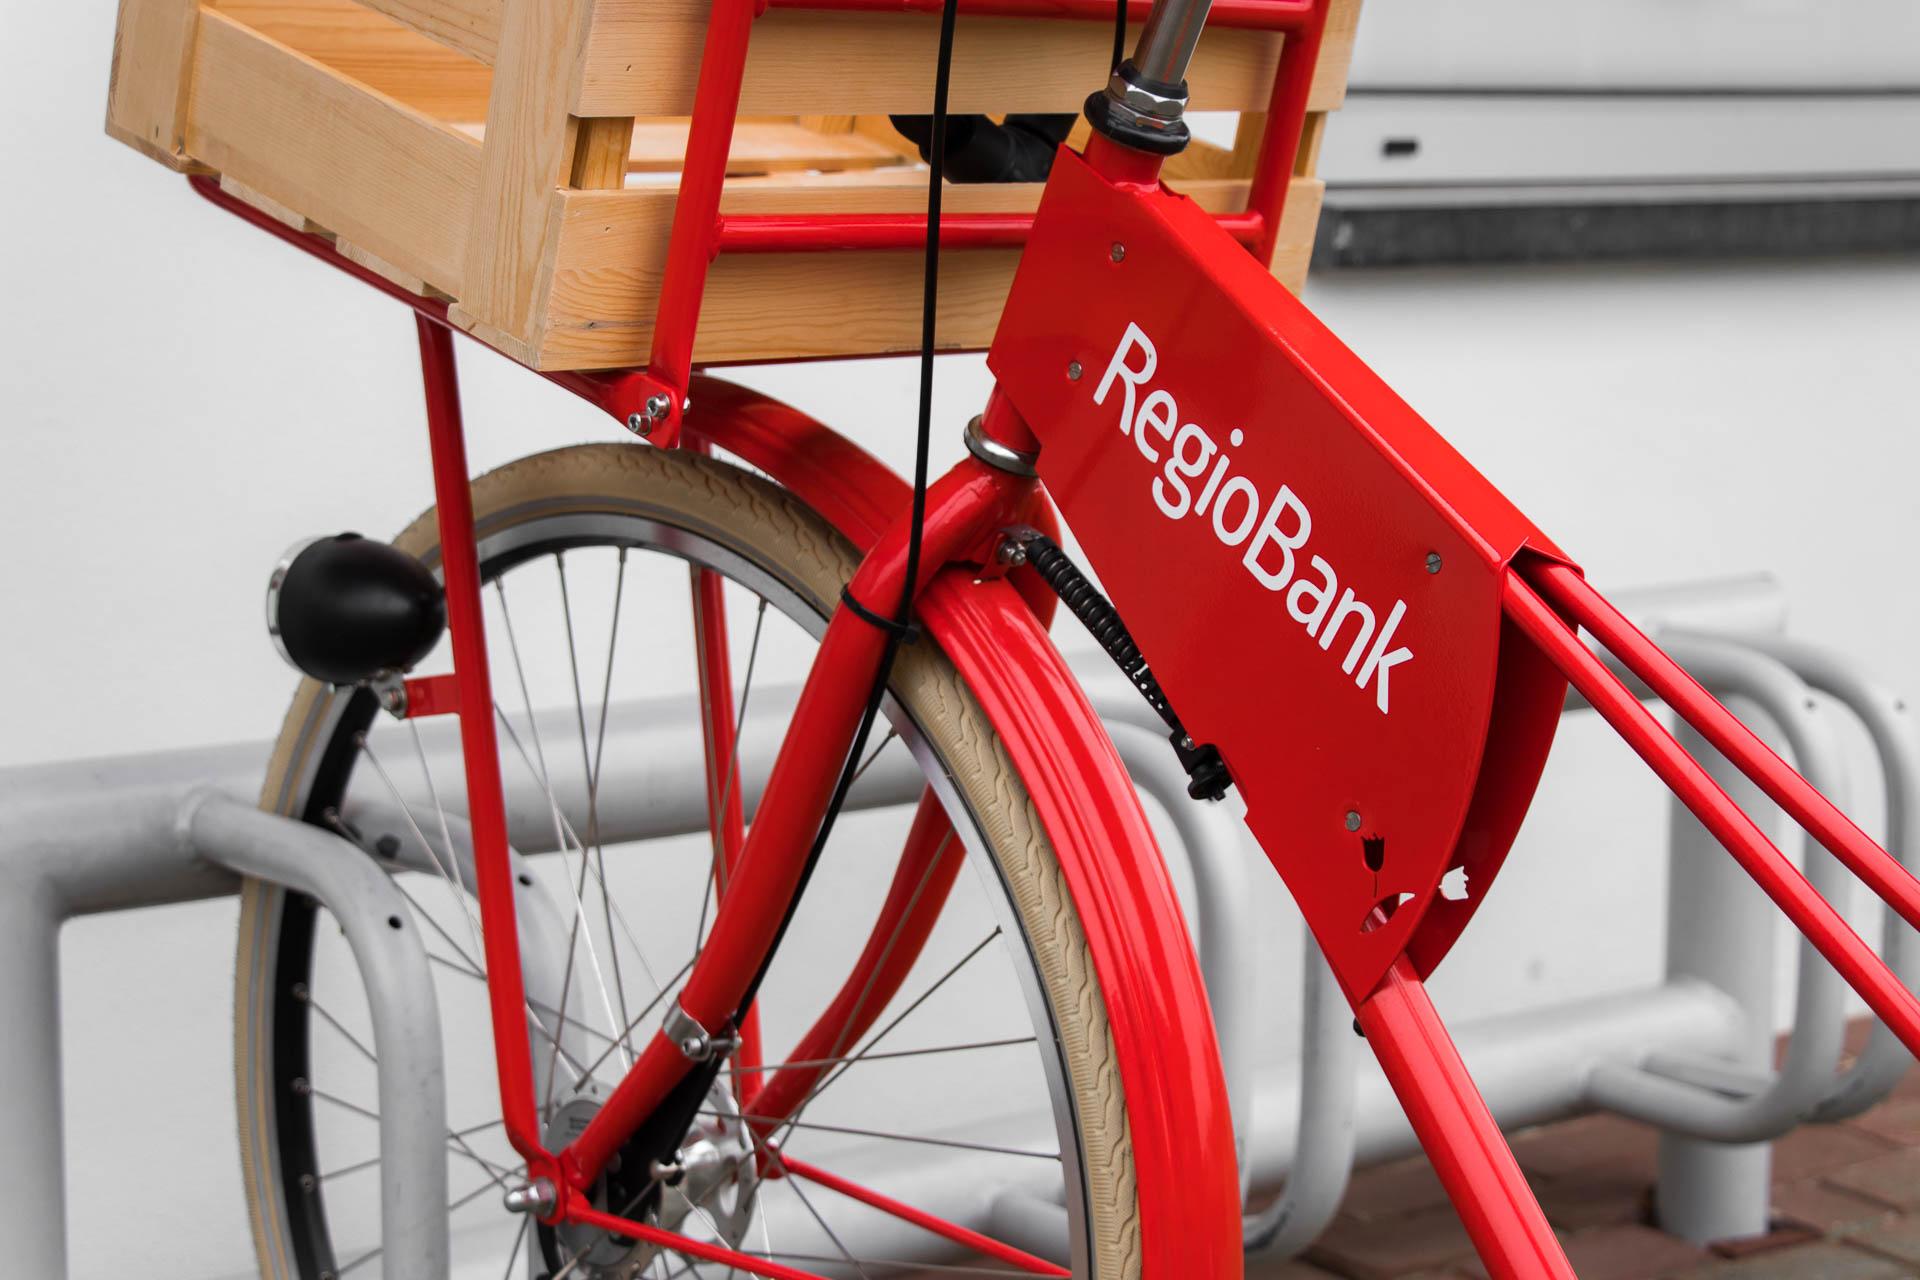 Regiobank foto